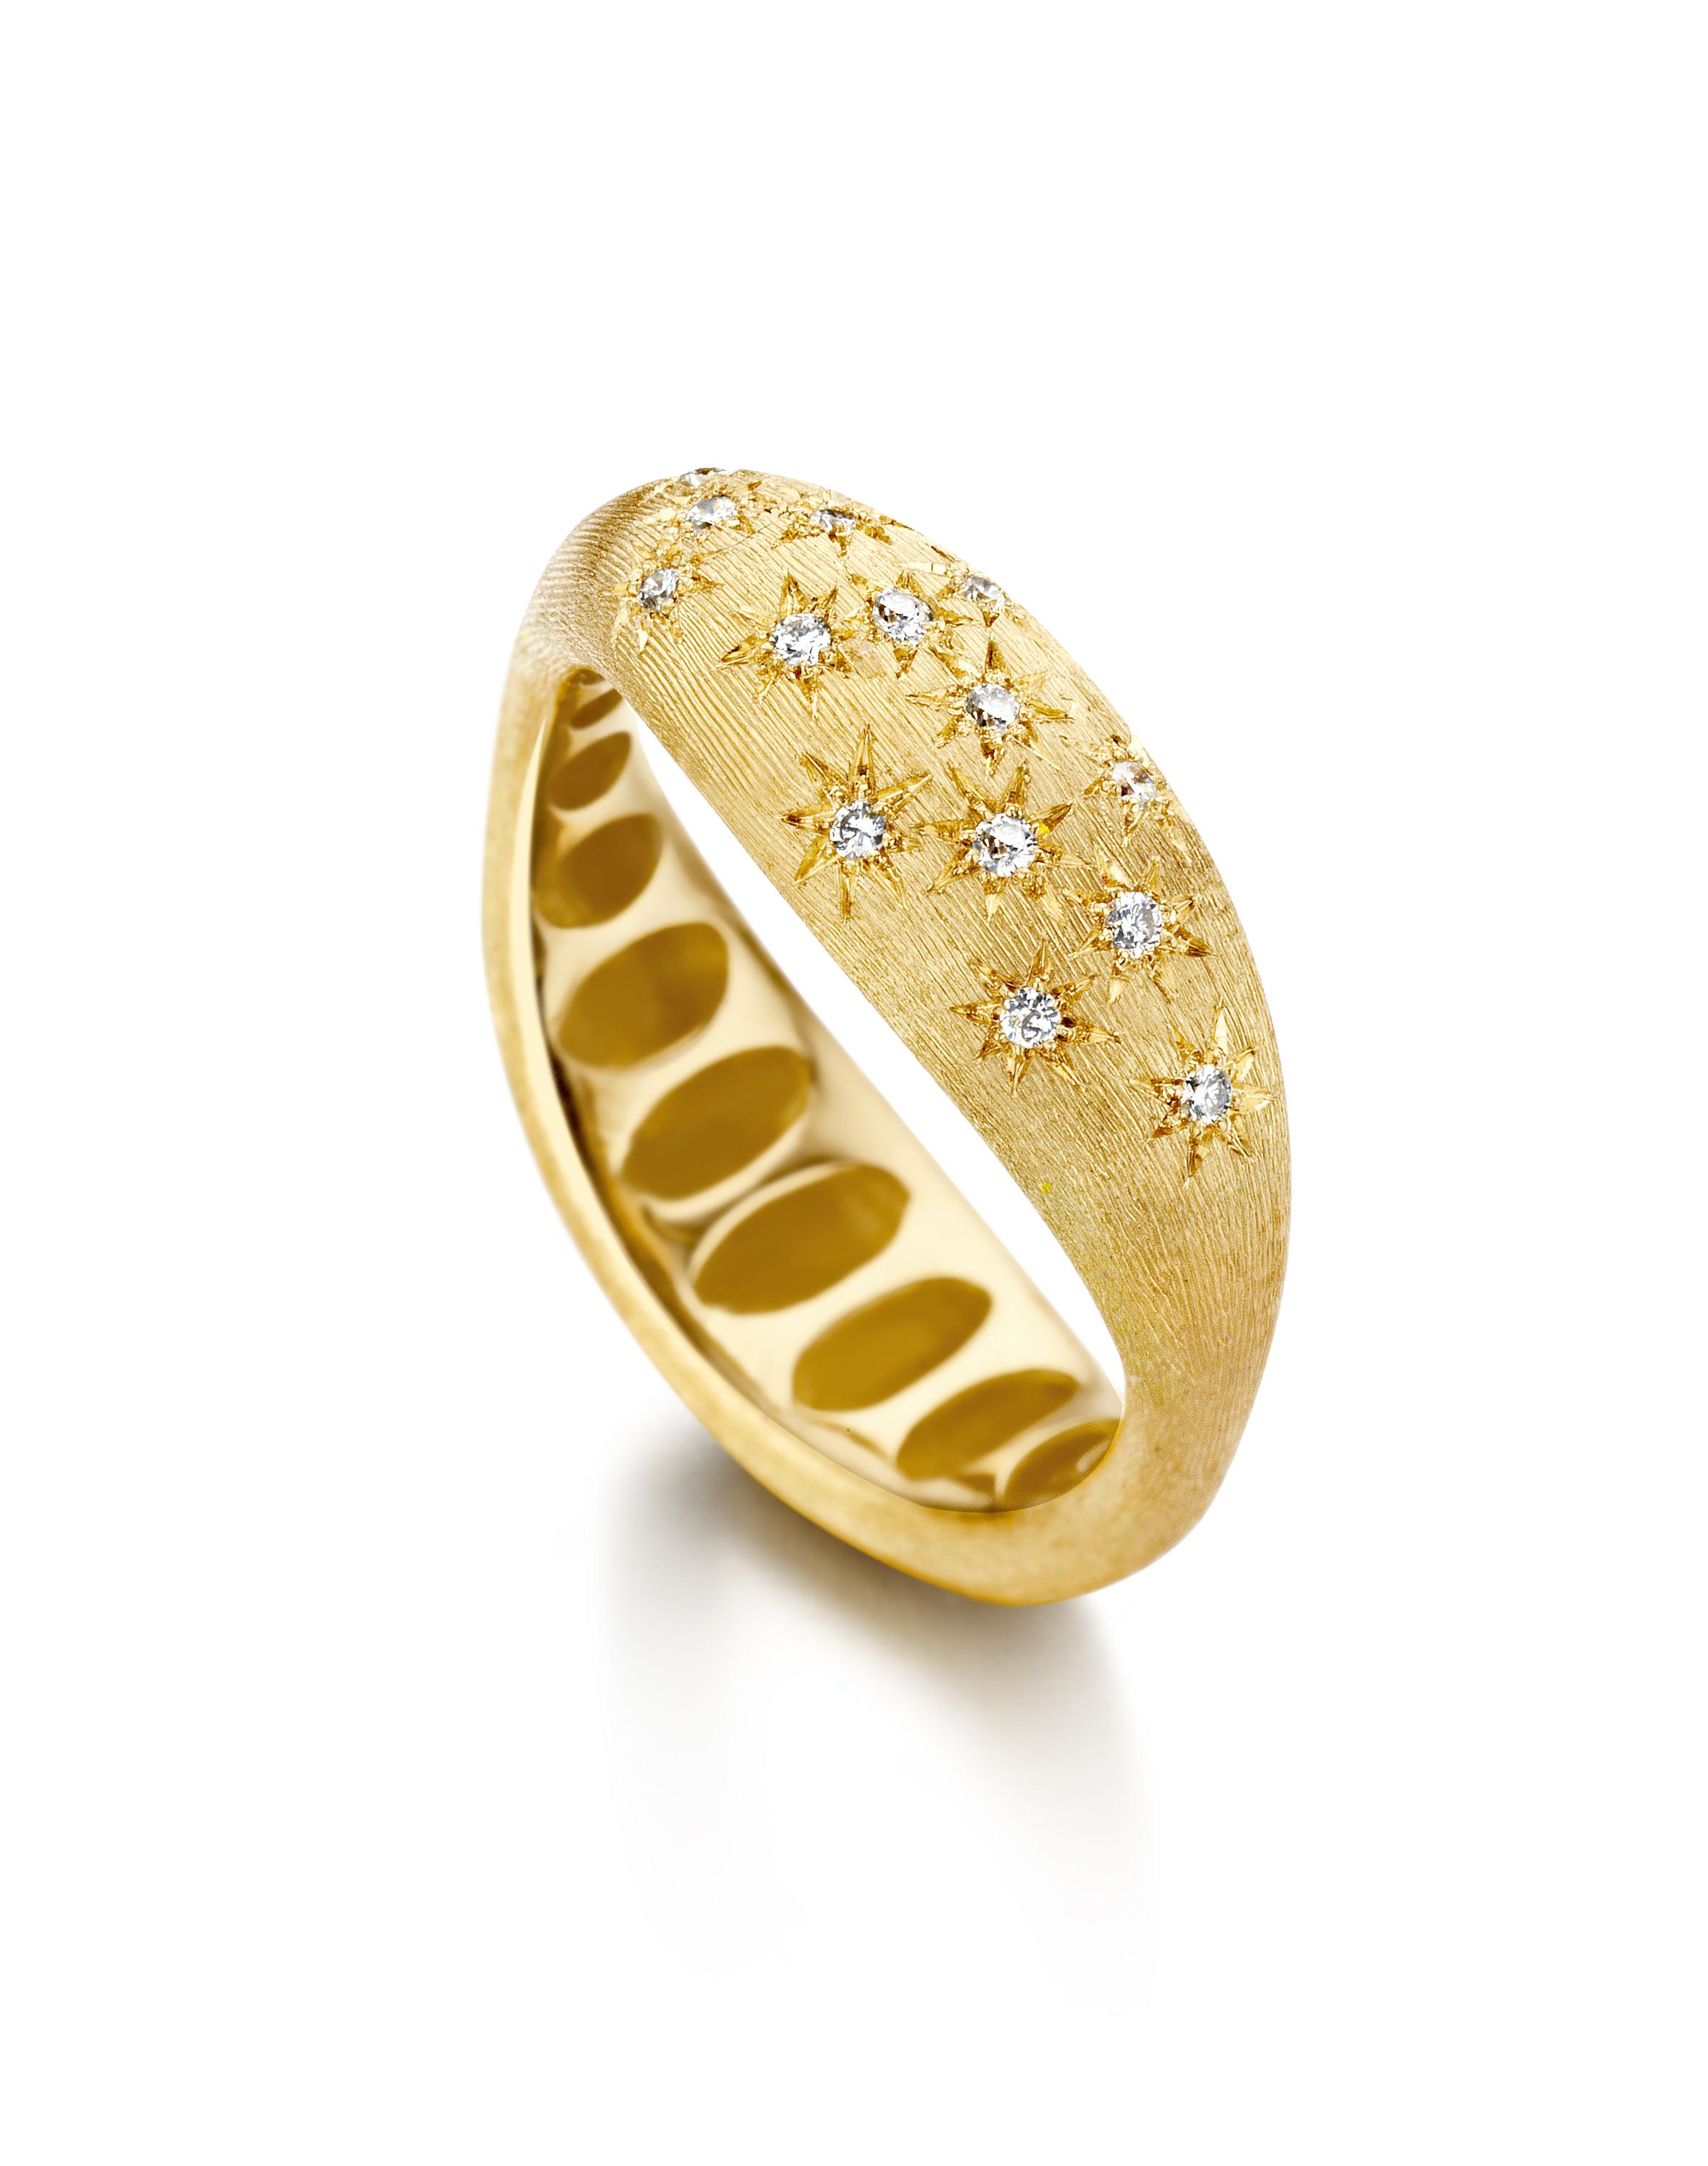 Nanis Ring | Camarillo Jewelers | Van Gundys